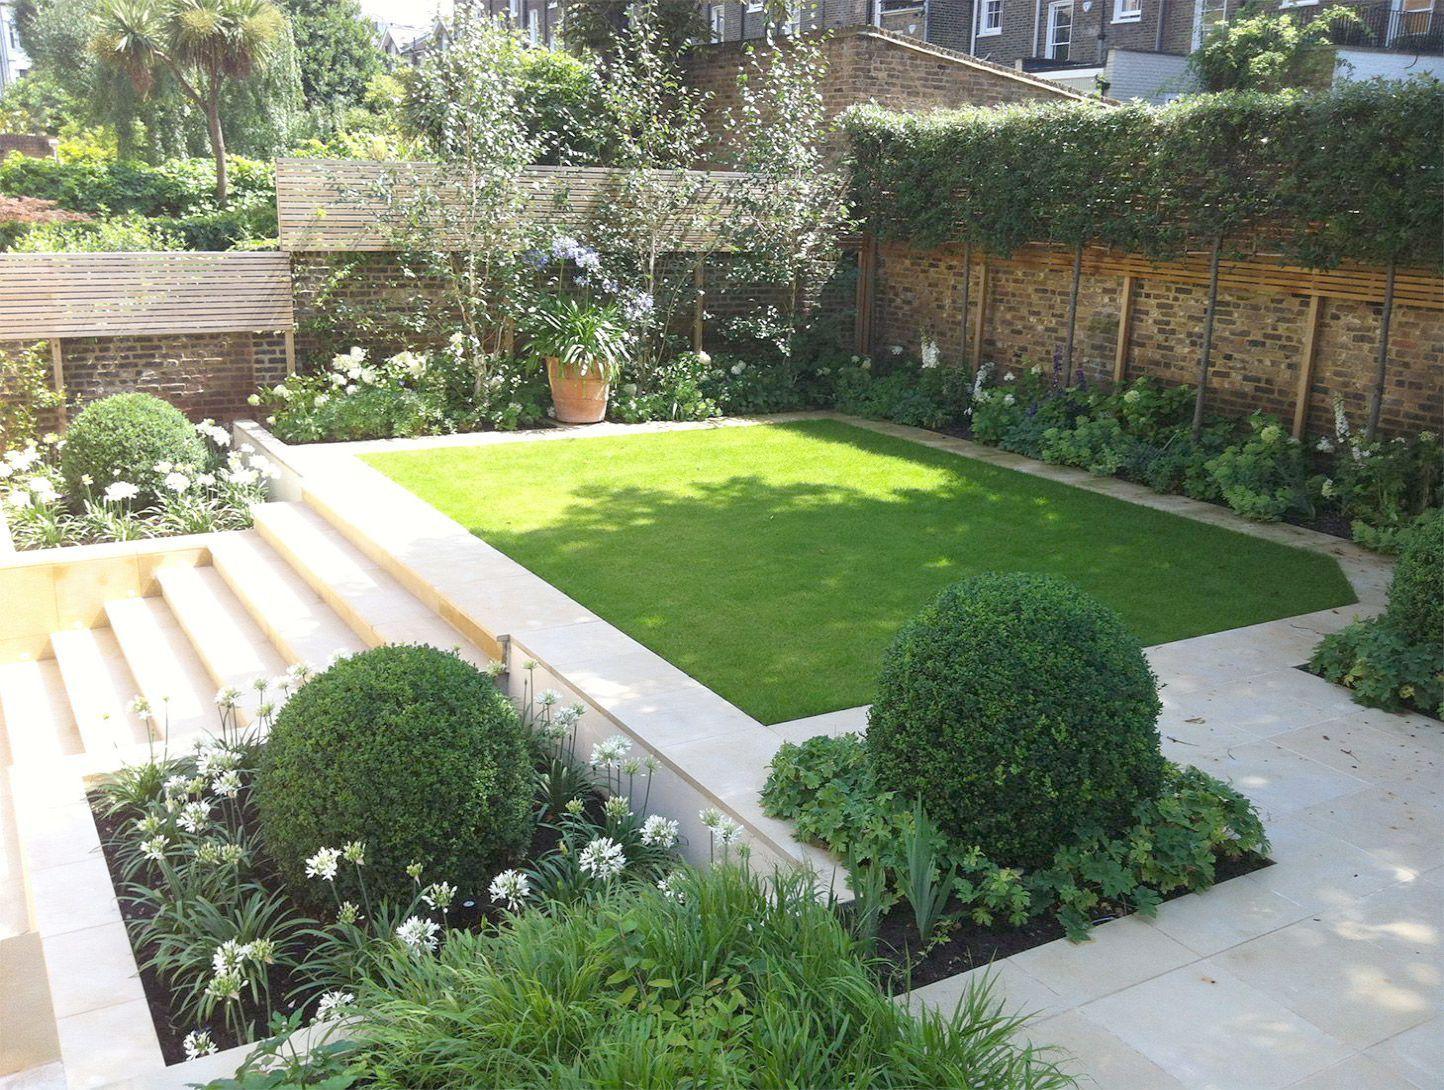 Landscape Gardening Course London Landscape Gardening Grantham Landscape Gardening Course Manch Backyard Landscaping Modern Garden Garden Design